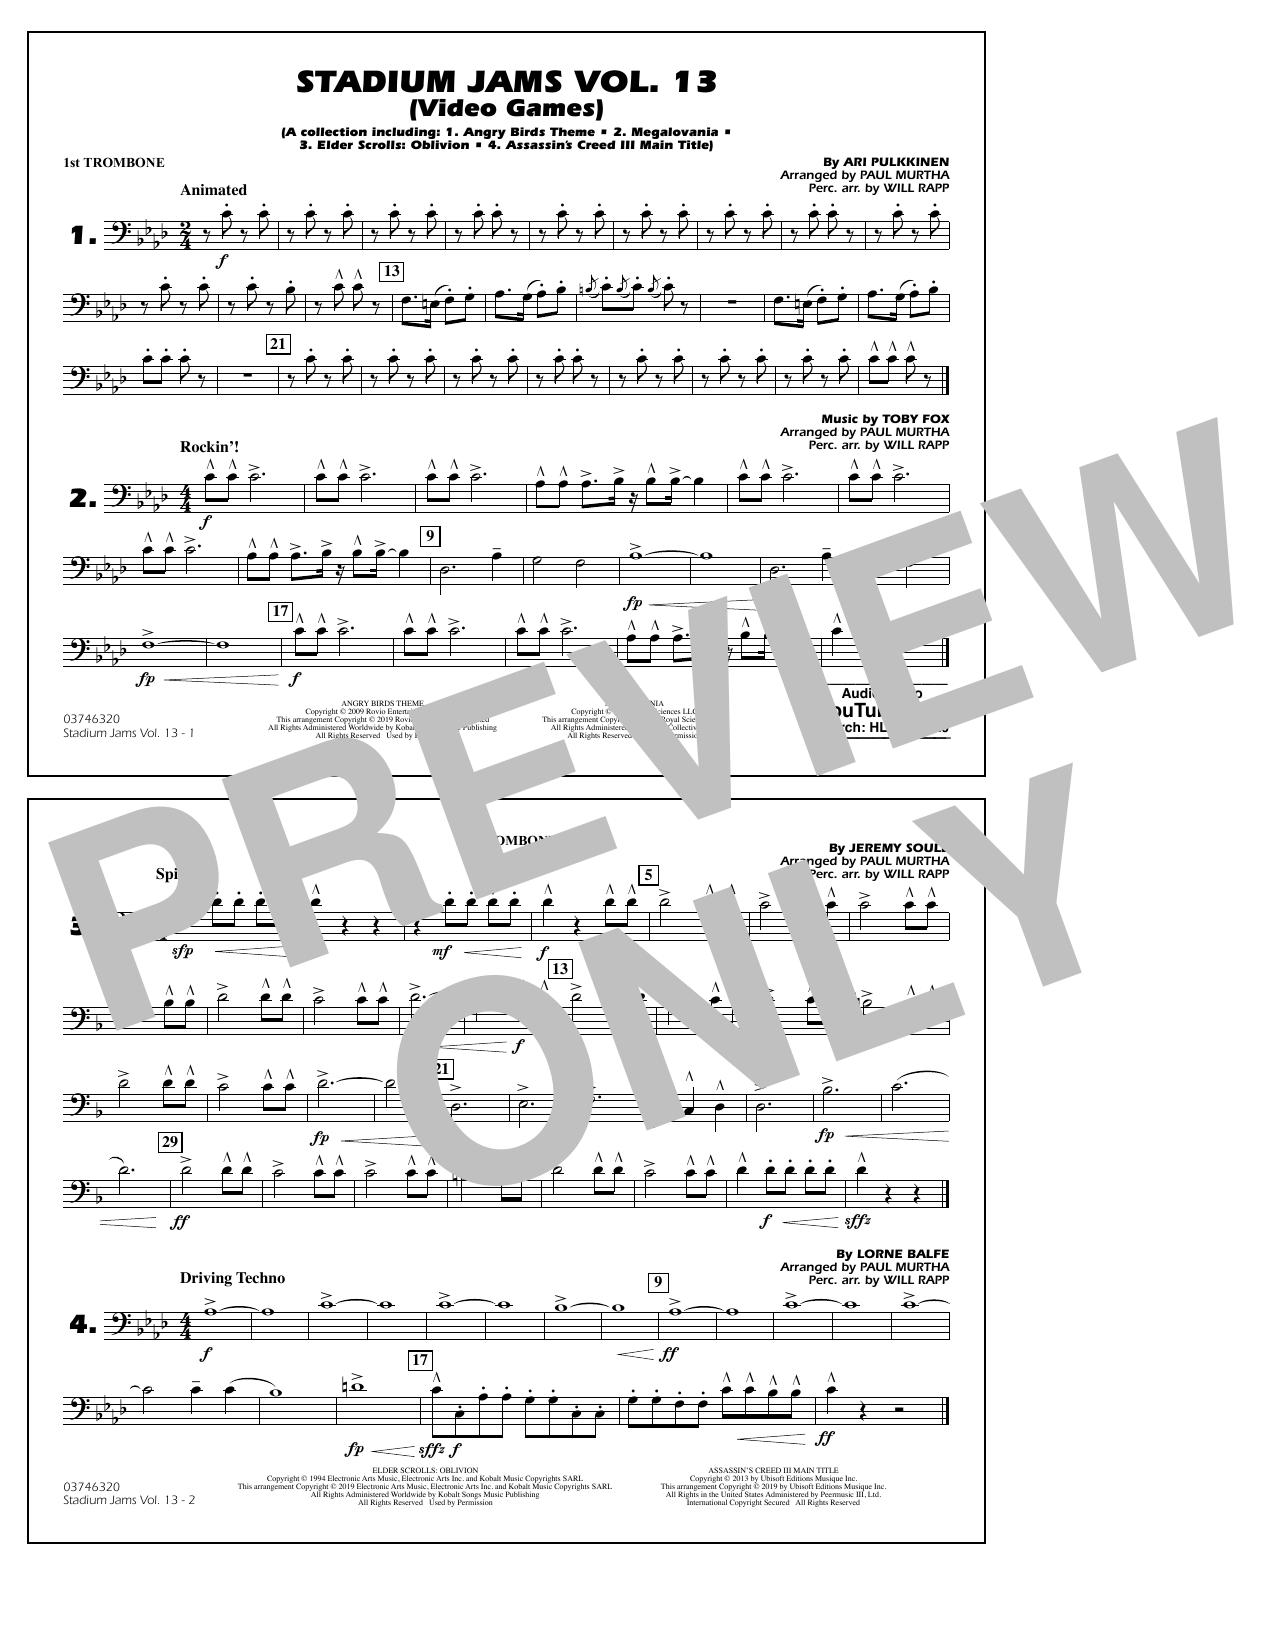 Stadium Jams Volume 13 (Video Games) - 1st Trombone (Marching Band)